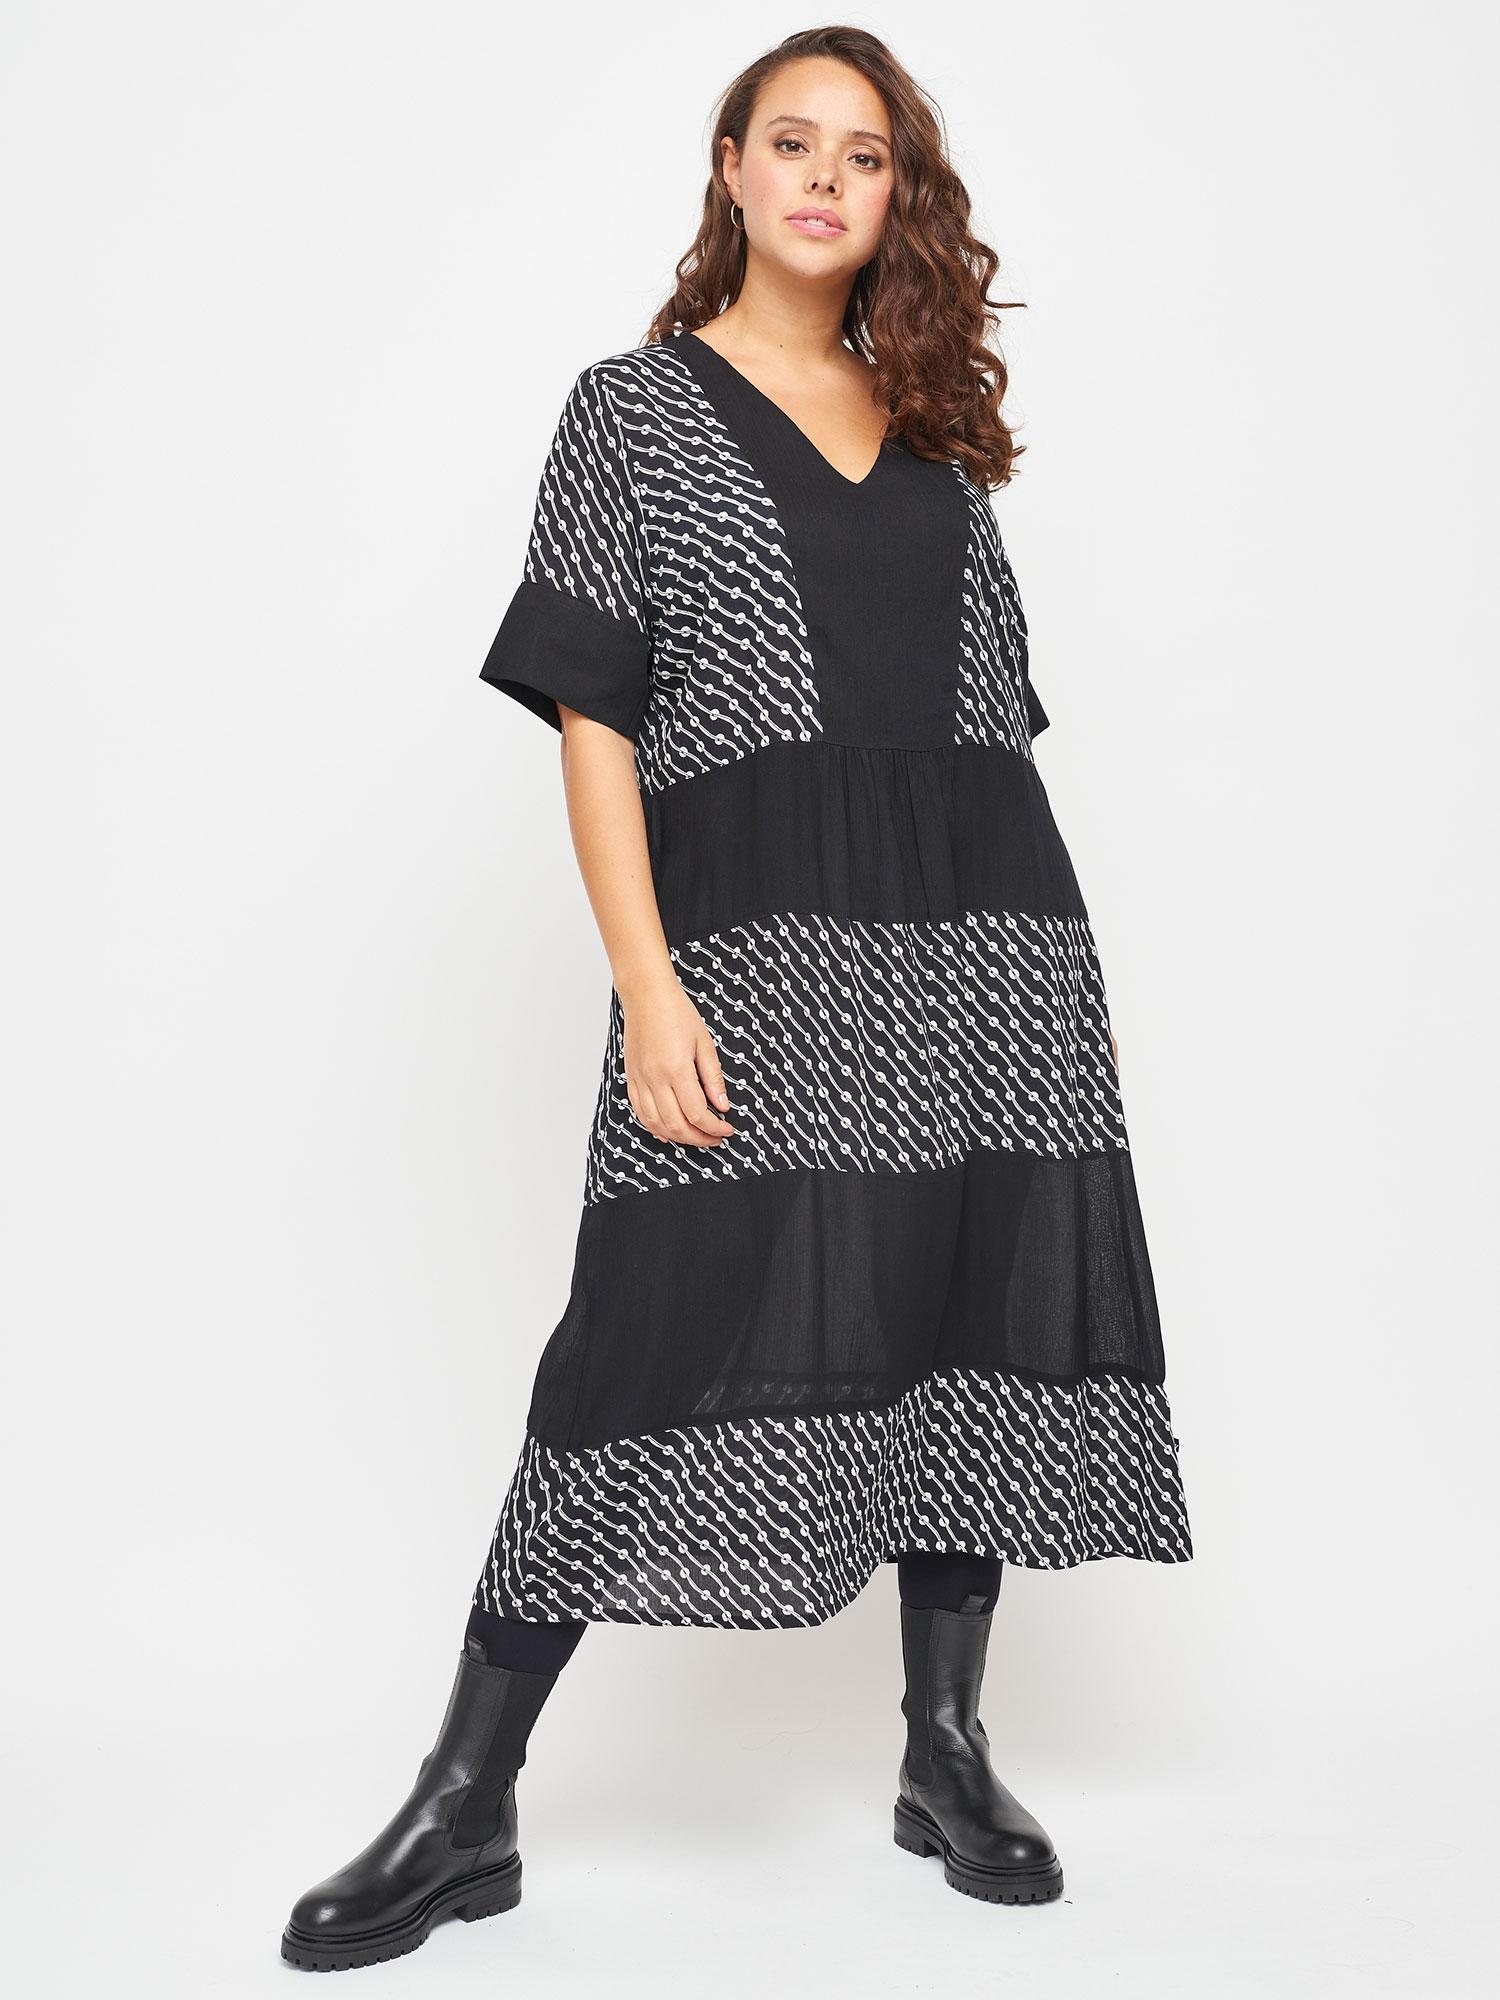 Adia Flot lang kjole med grafisk sort / hvid mønster, 42-44 / S